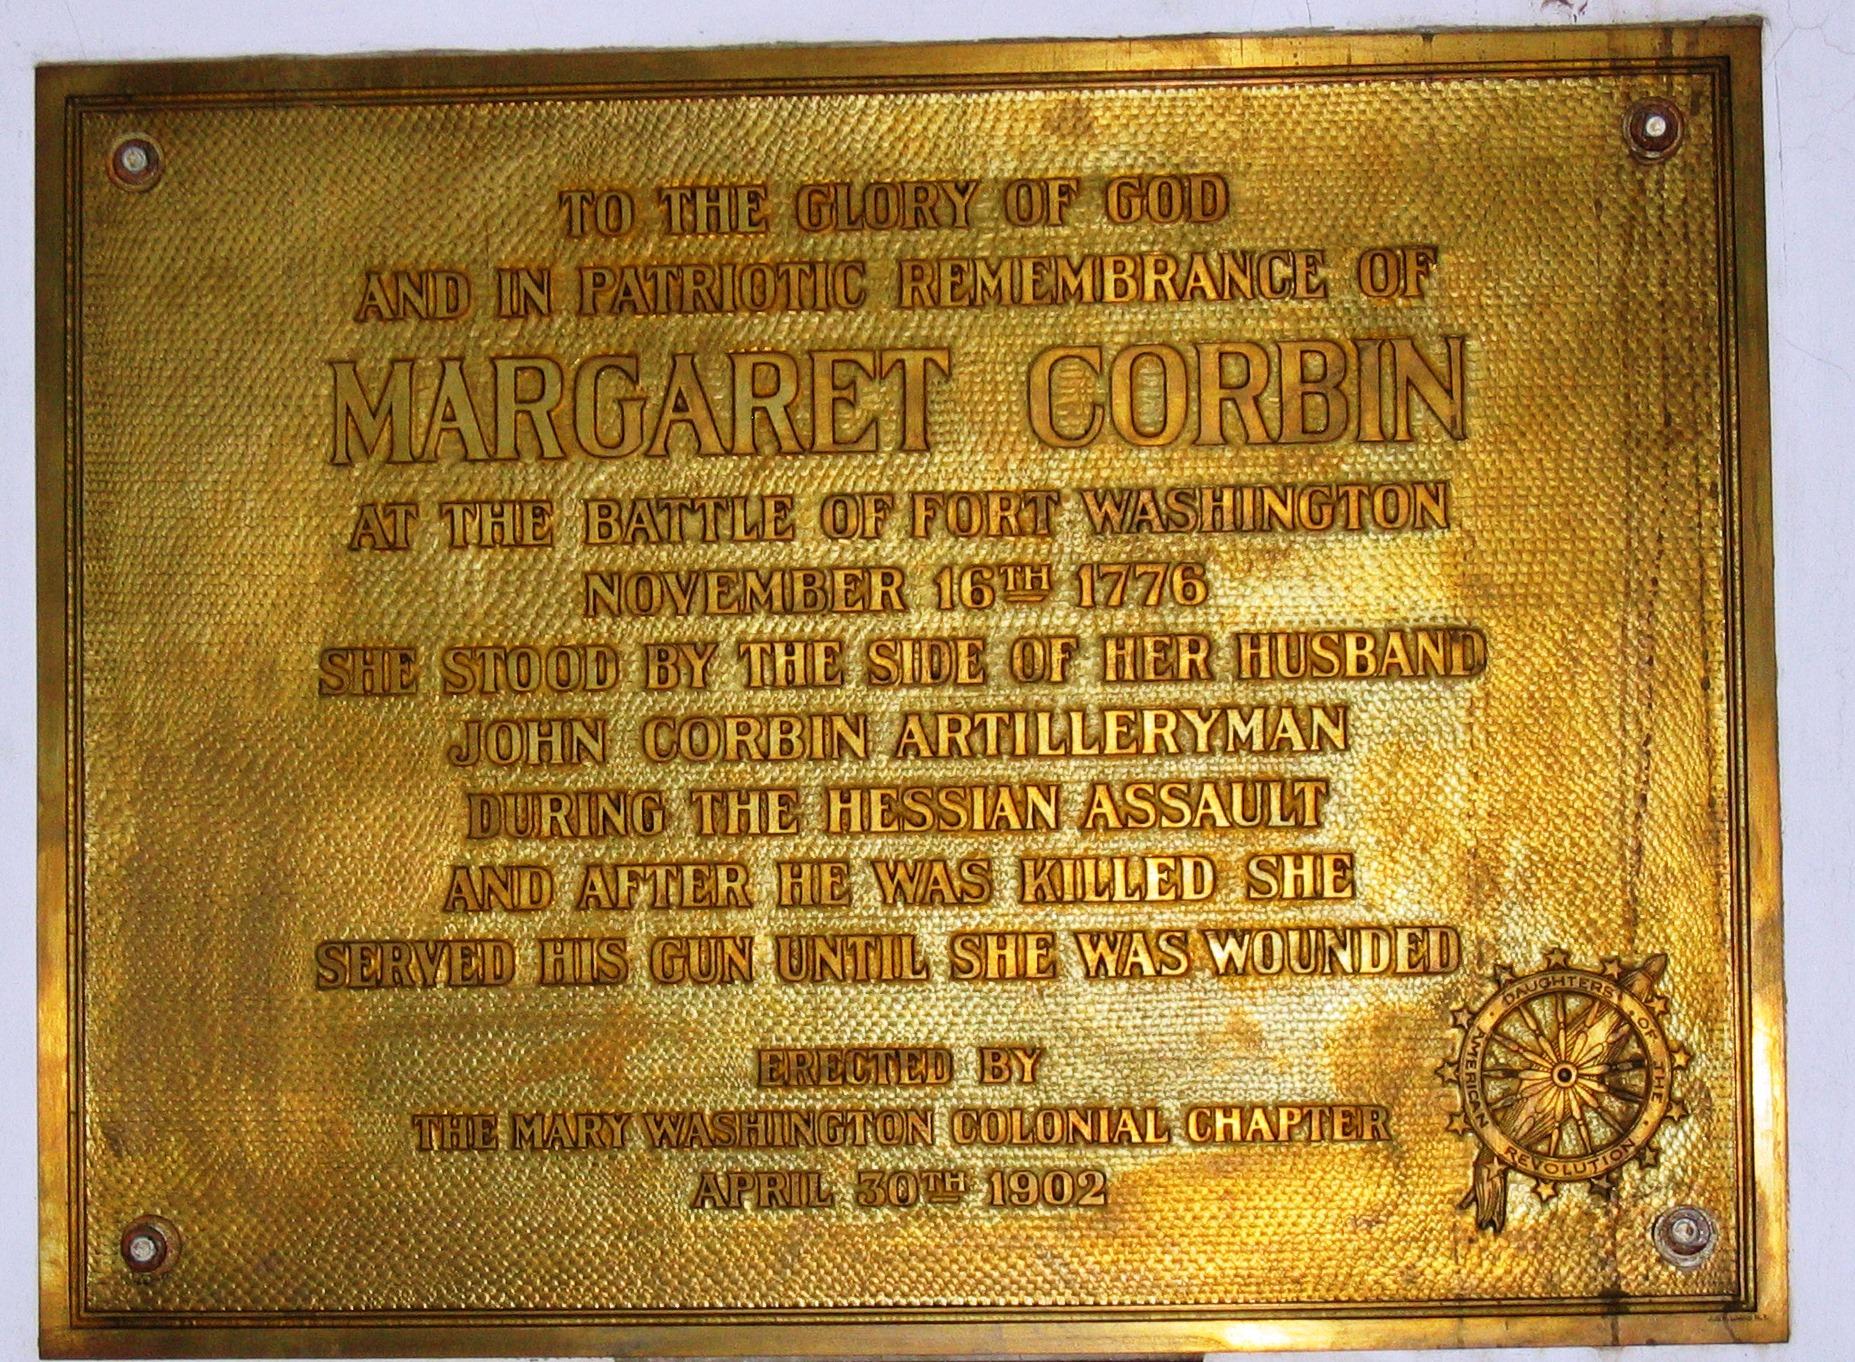 Margaret Corbin, 4-30-1902